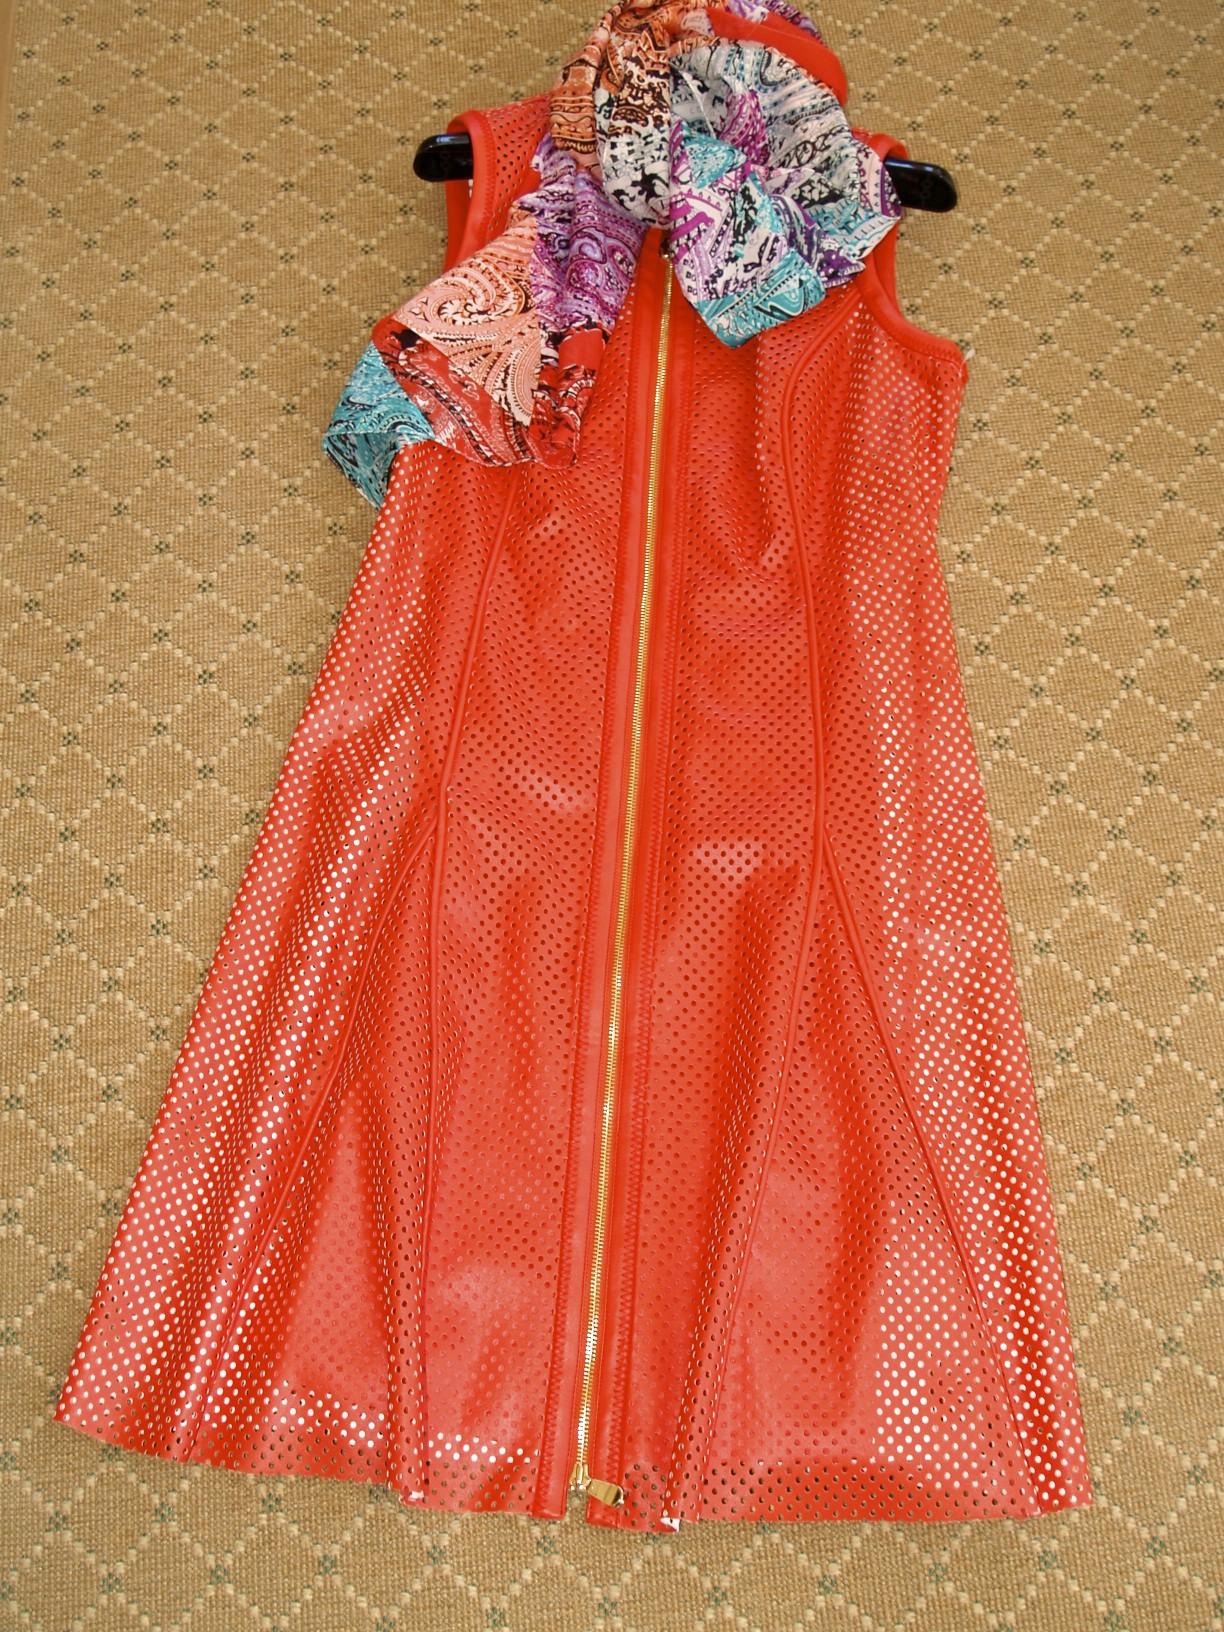 Carlisle women's fashion